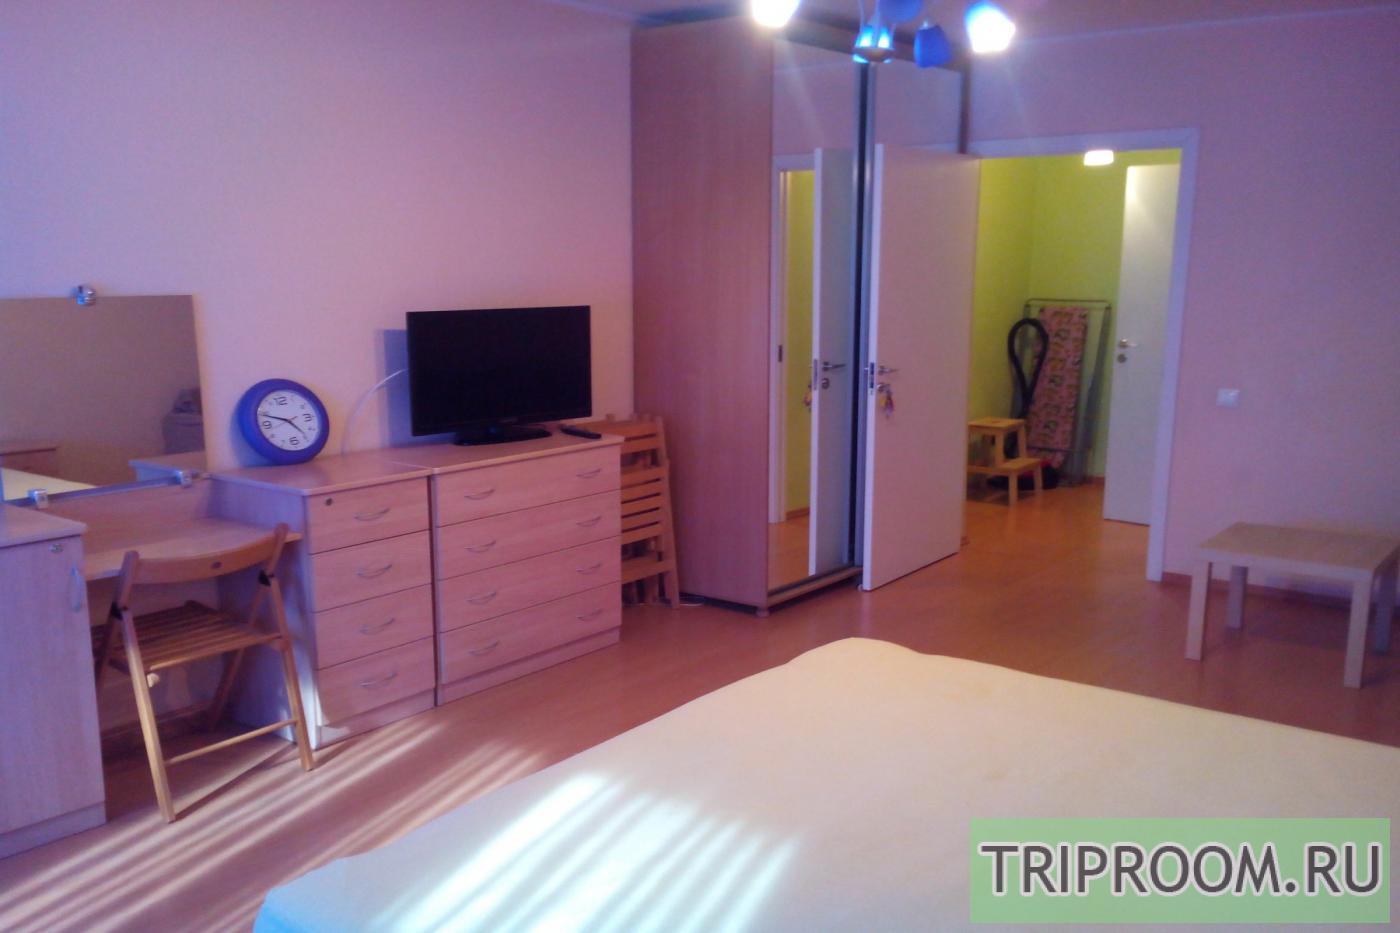 2-комнатная квартира посуточно (вариант № 10044), ул. Ломоносова улица, фото № 18